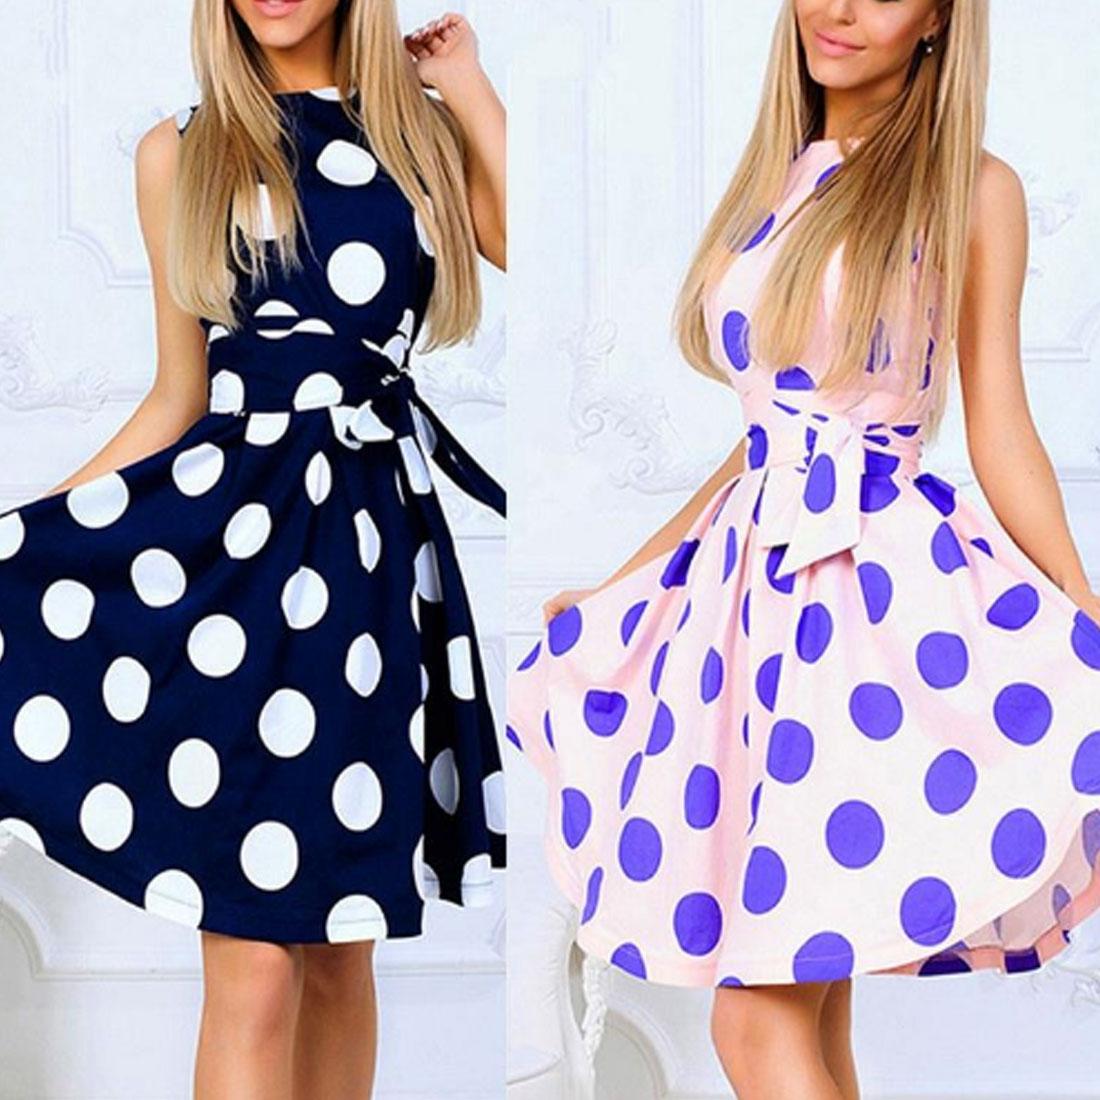 Polka Dot Dress Elegant Sweet Female Sleeveless O Neck Print Party Dresses Summer Casual A Line Dress Plus Size swing dress in Dresses from Women 39 s Clothing